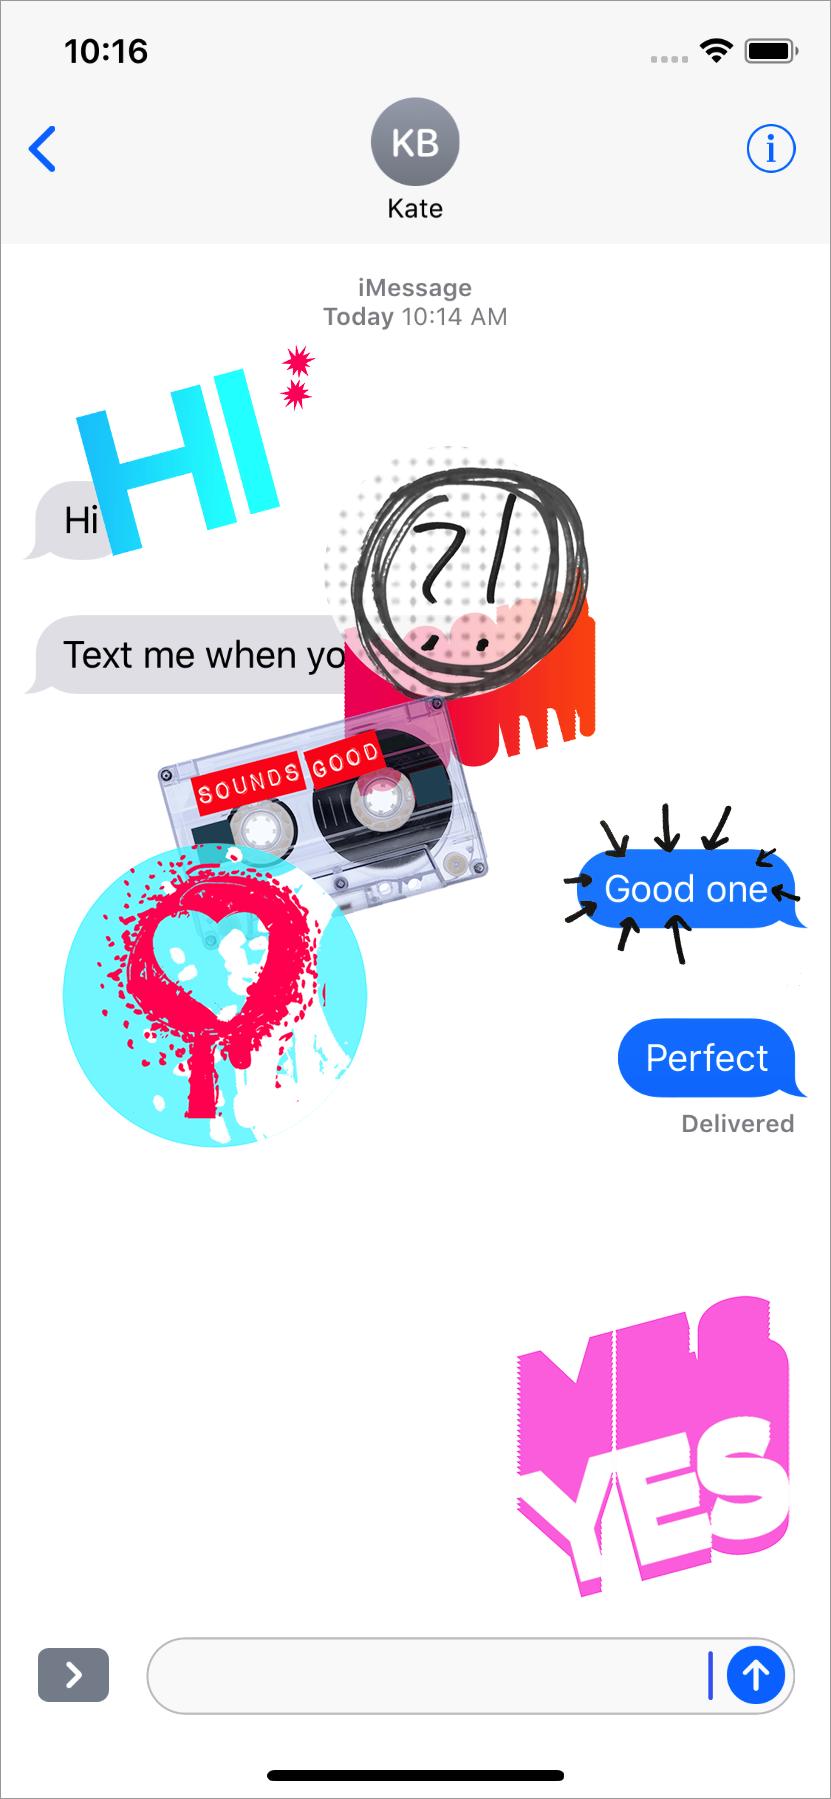 Flashback-Sticker-Attack-iMessage-01.png